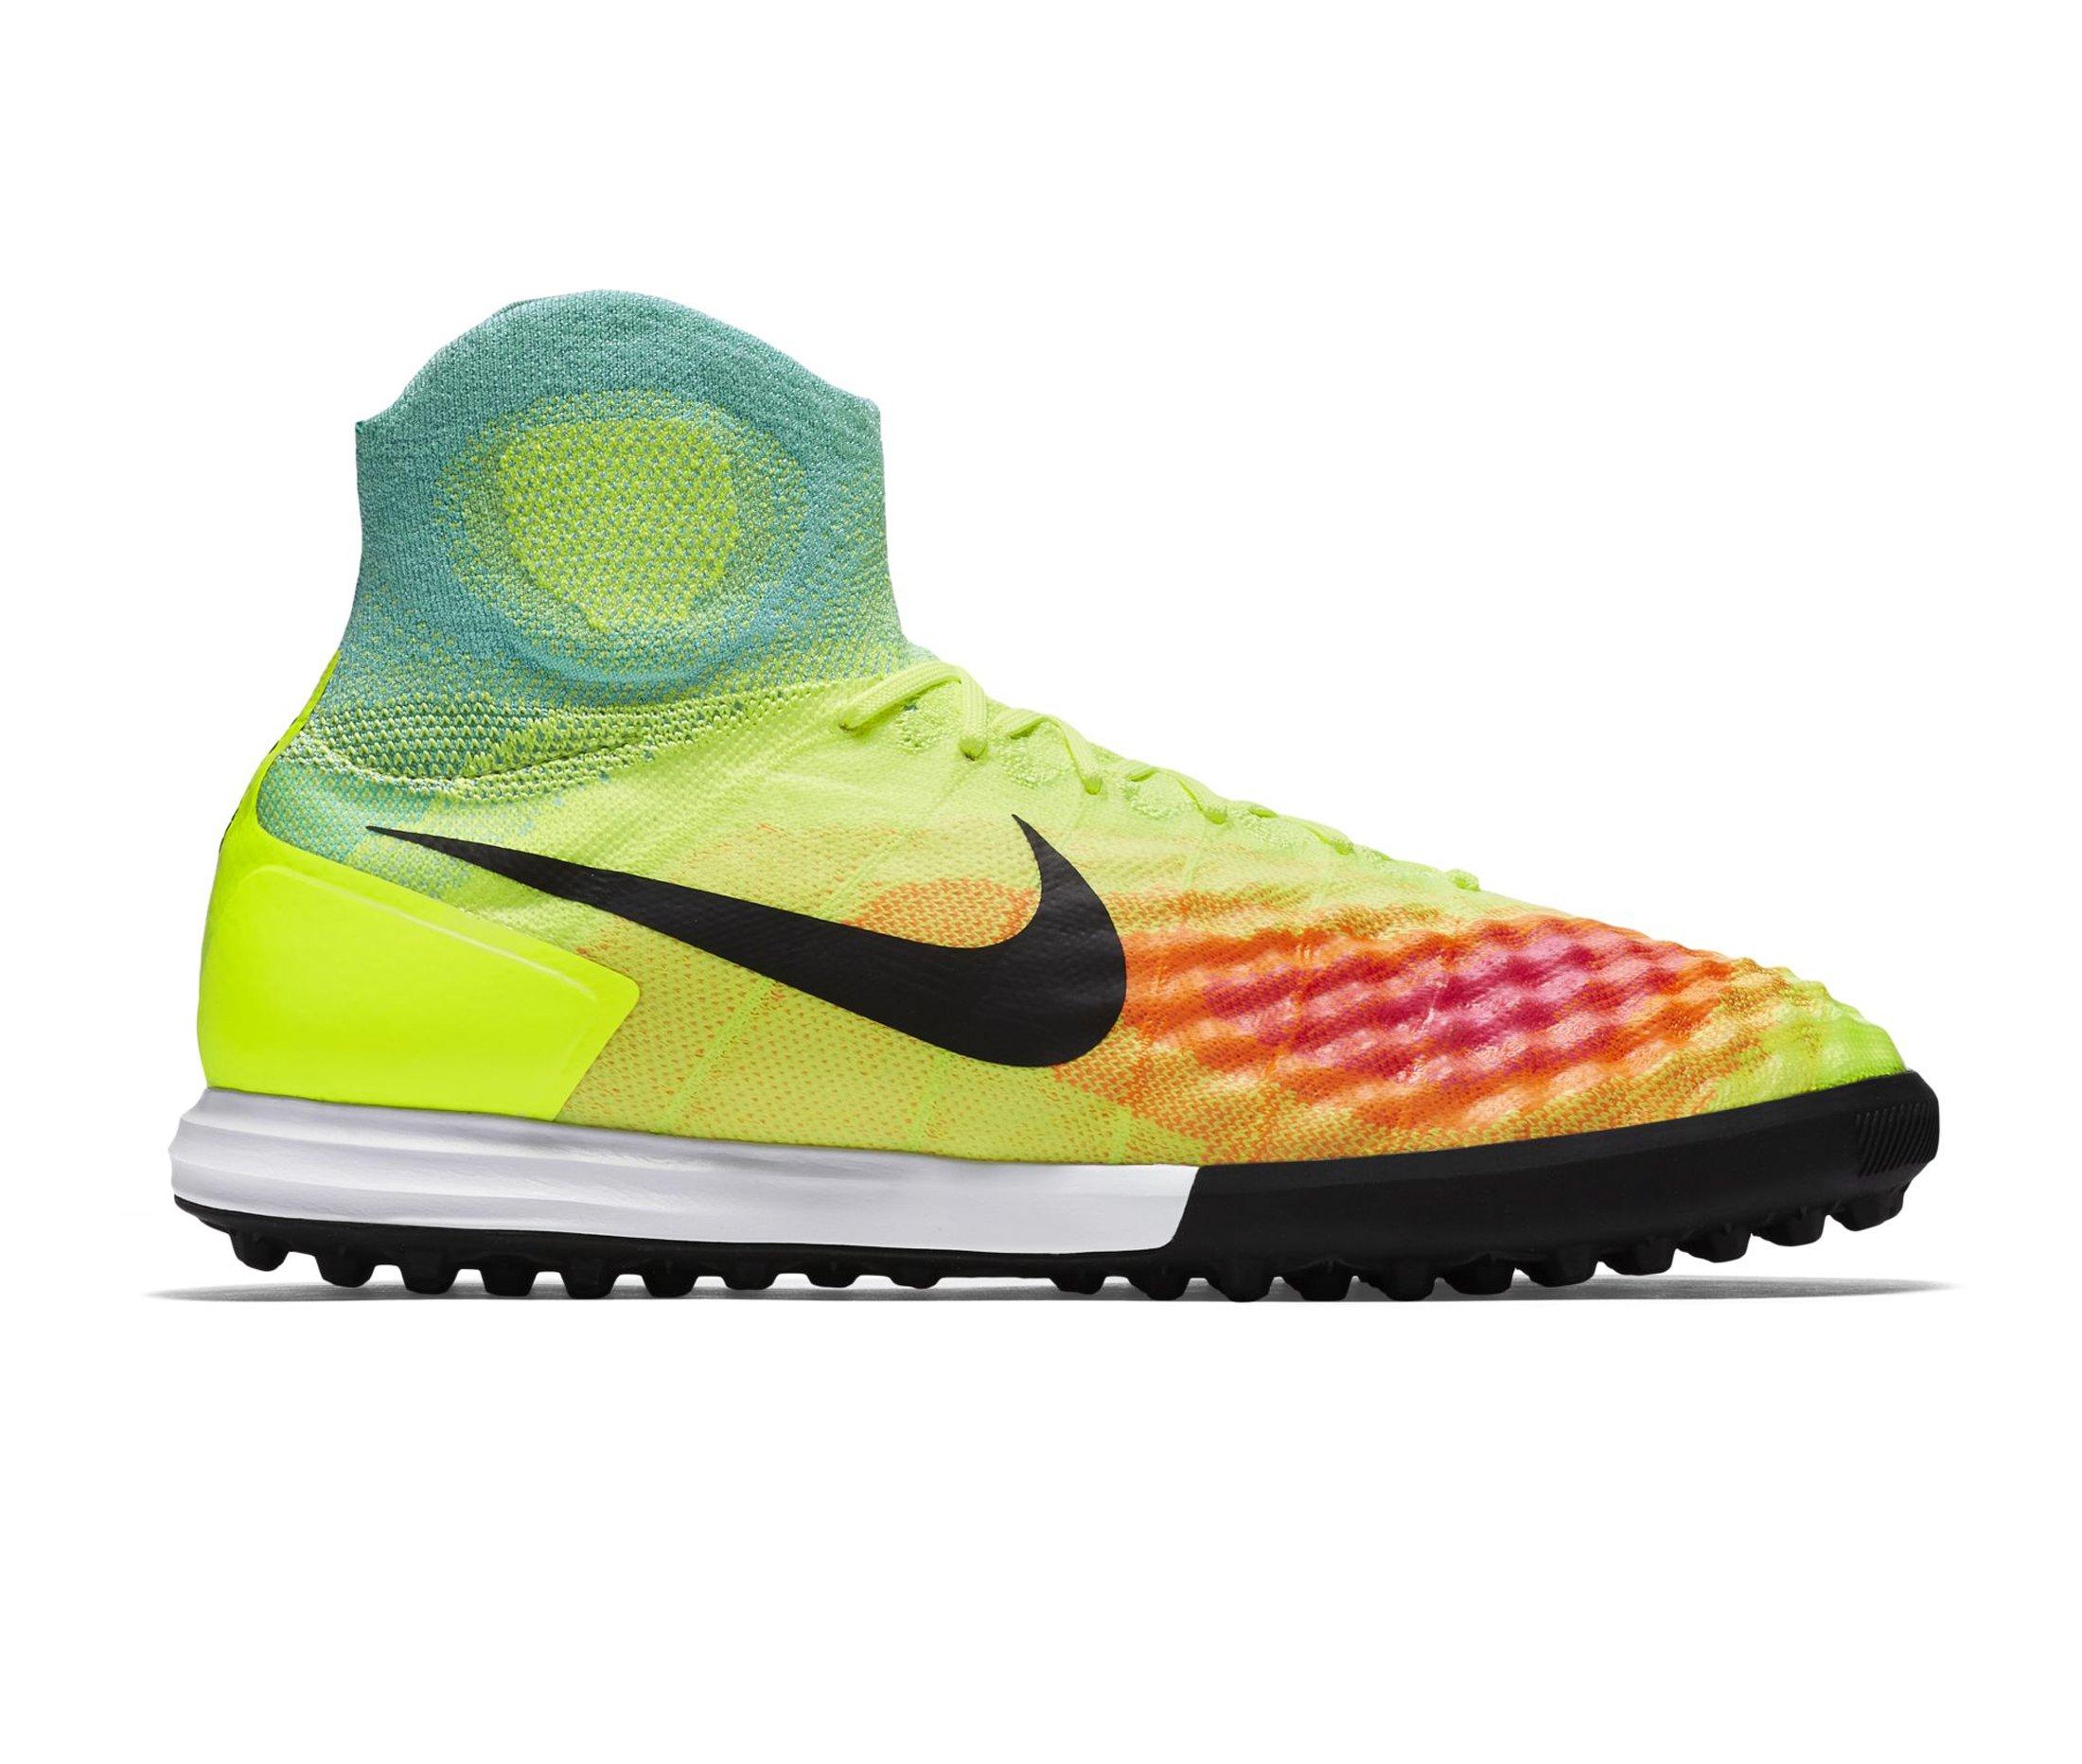 Giầy thể thao chính hãng Nike Magistax Proximo II TF, Size 9.5US/ 43 EU